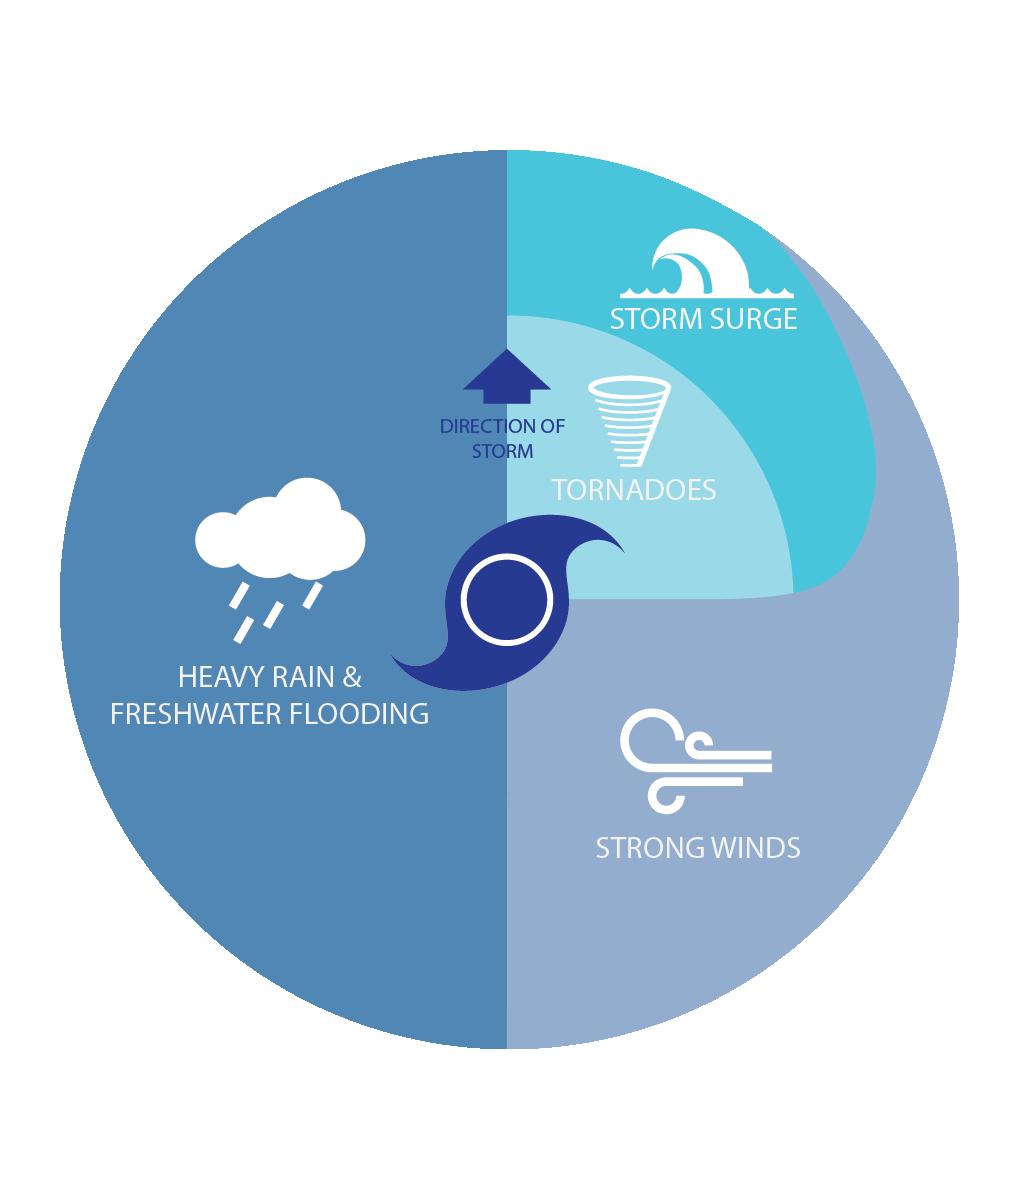 Primary Hazards Associated with Hurricanes